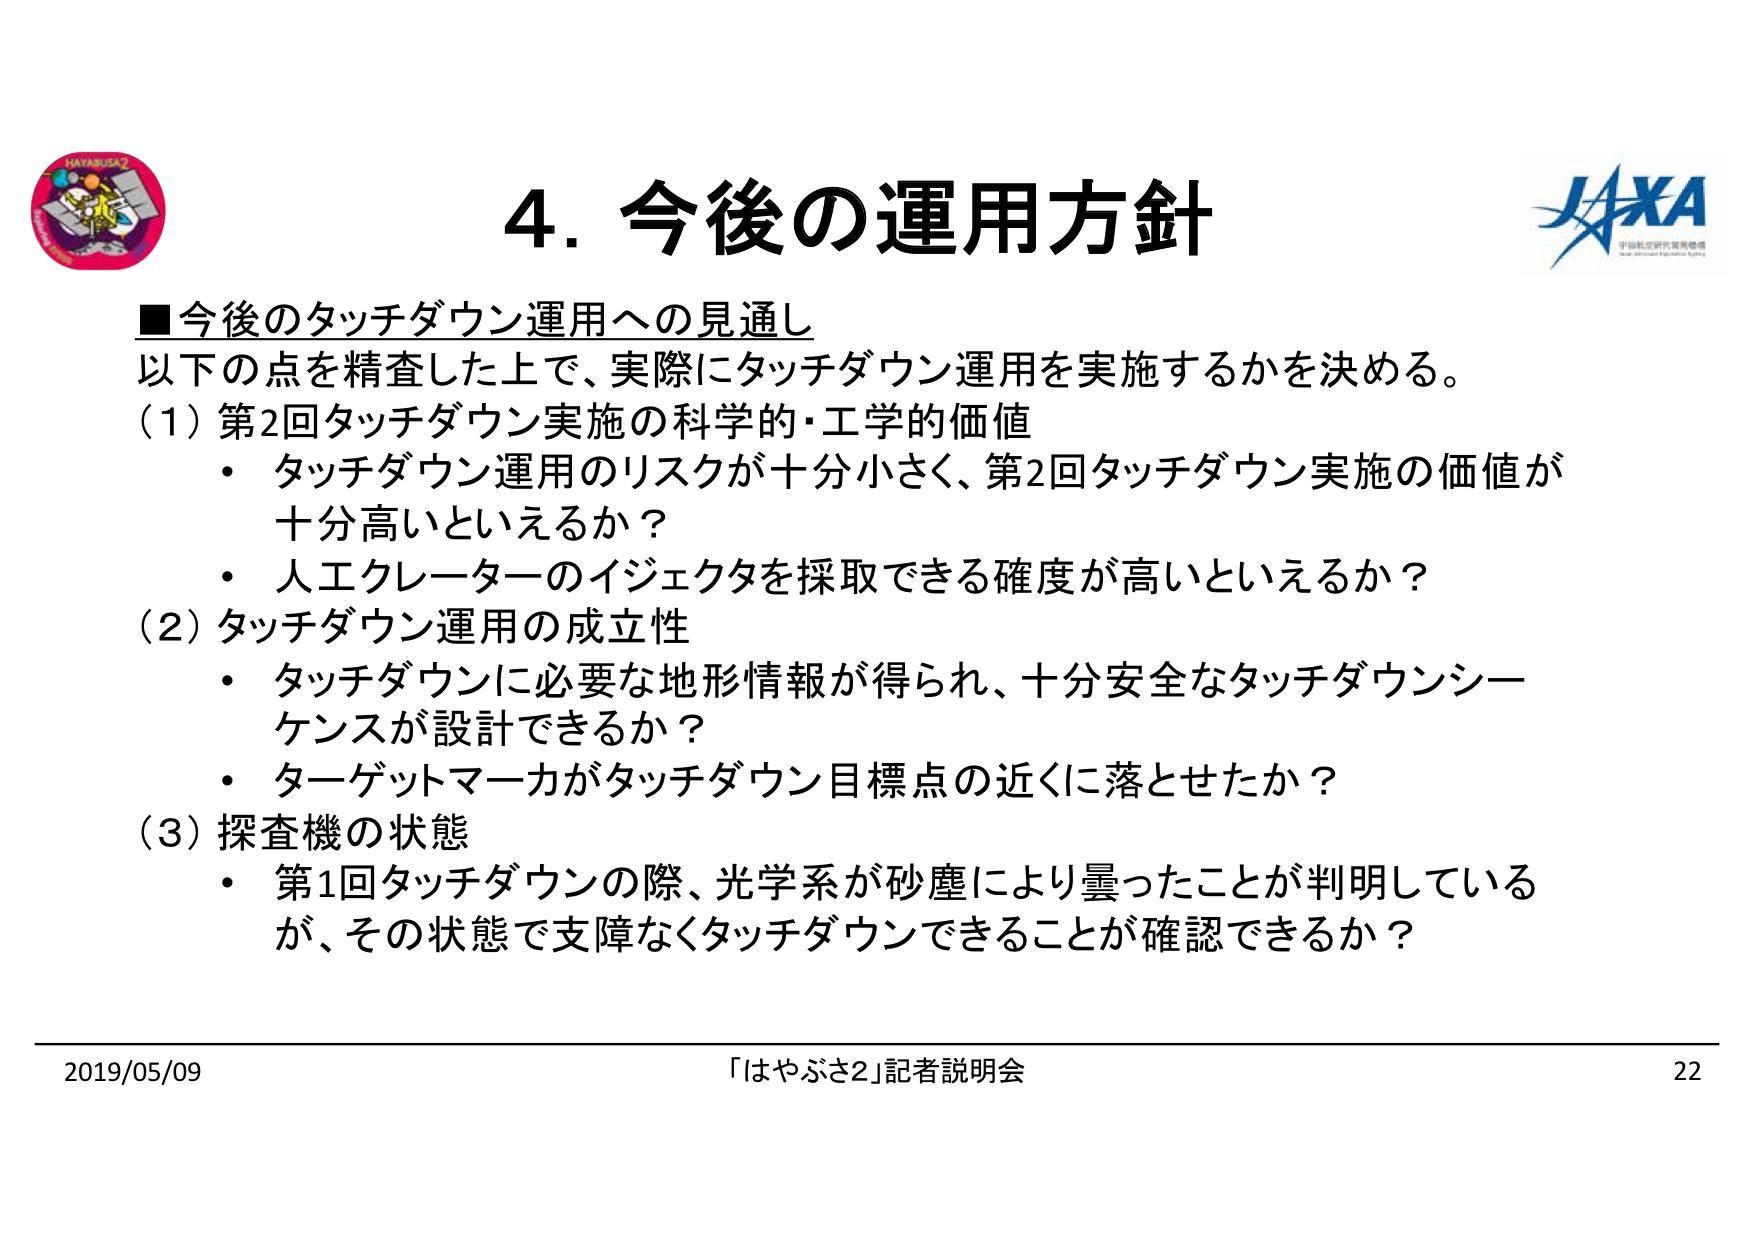 f:id:Imamura:20190509154418p:plain